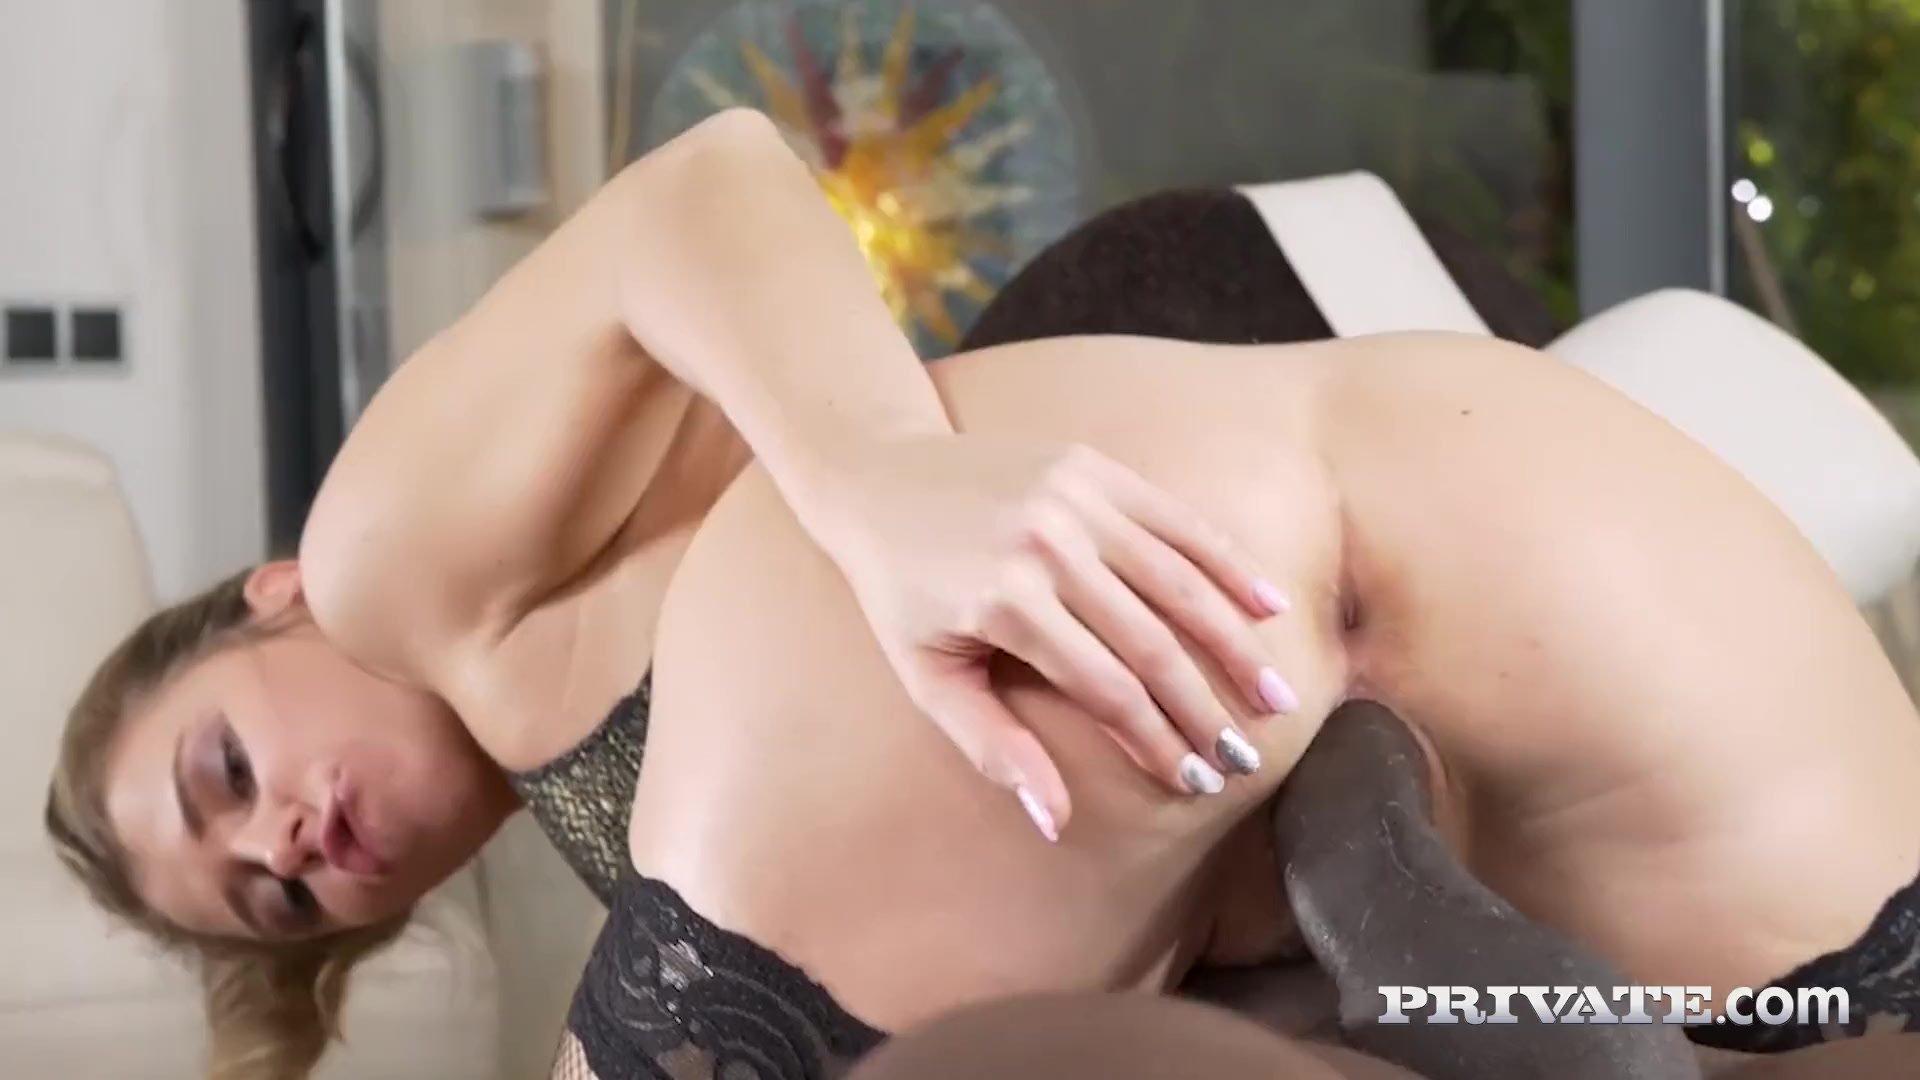 Private.com - Lingerie Babe Mary Kalisy Fucks Big Black Cock